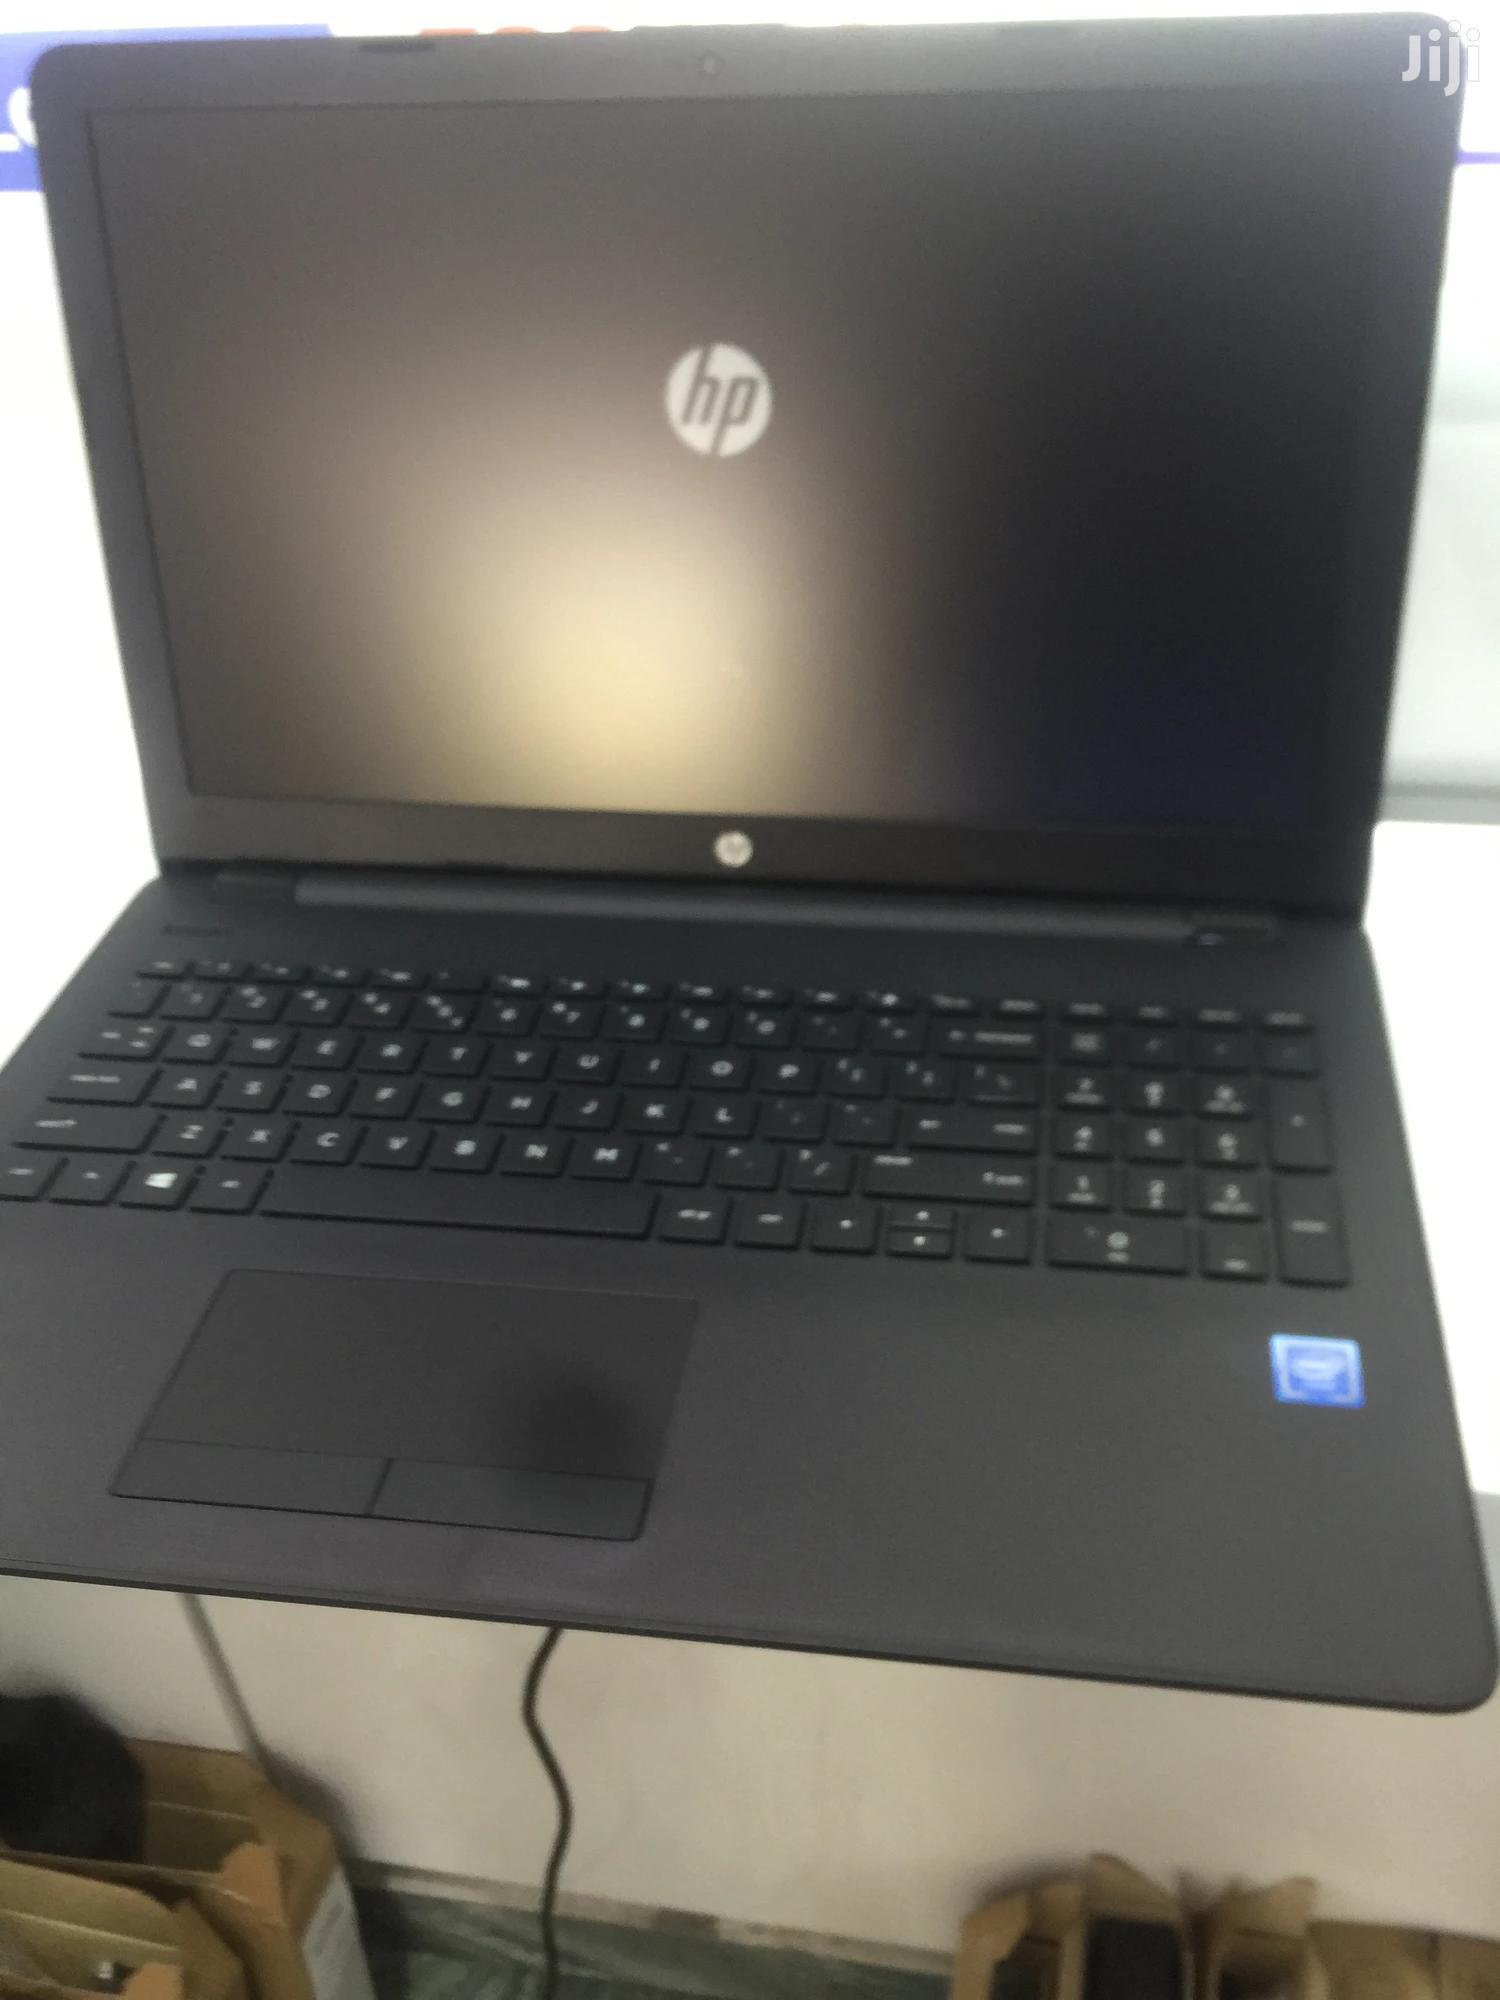 New Laptop HP 15-ra003nia 4GB Intel Celeron 500GB